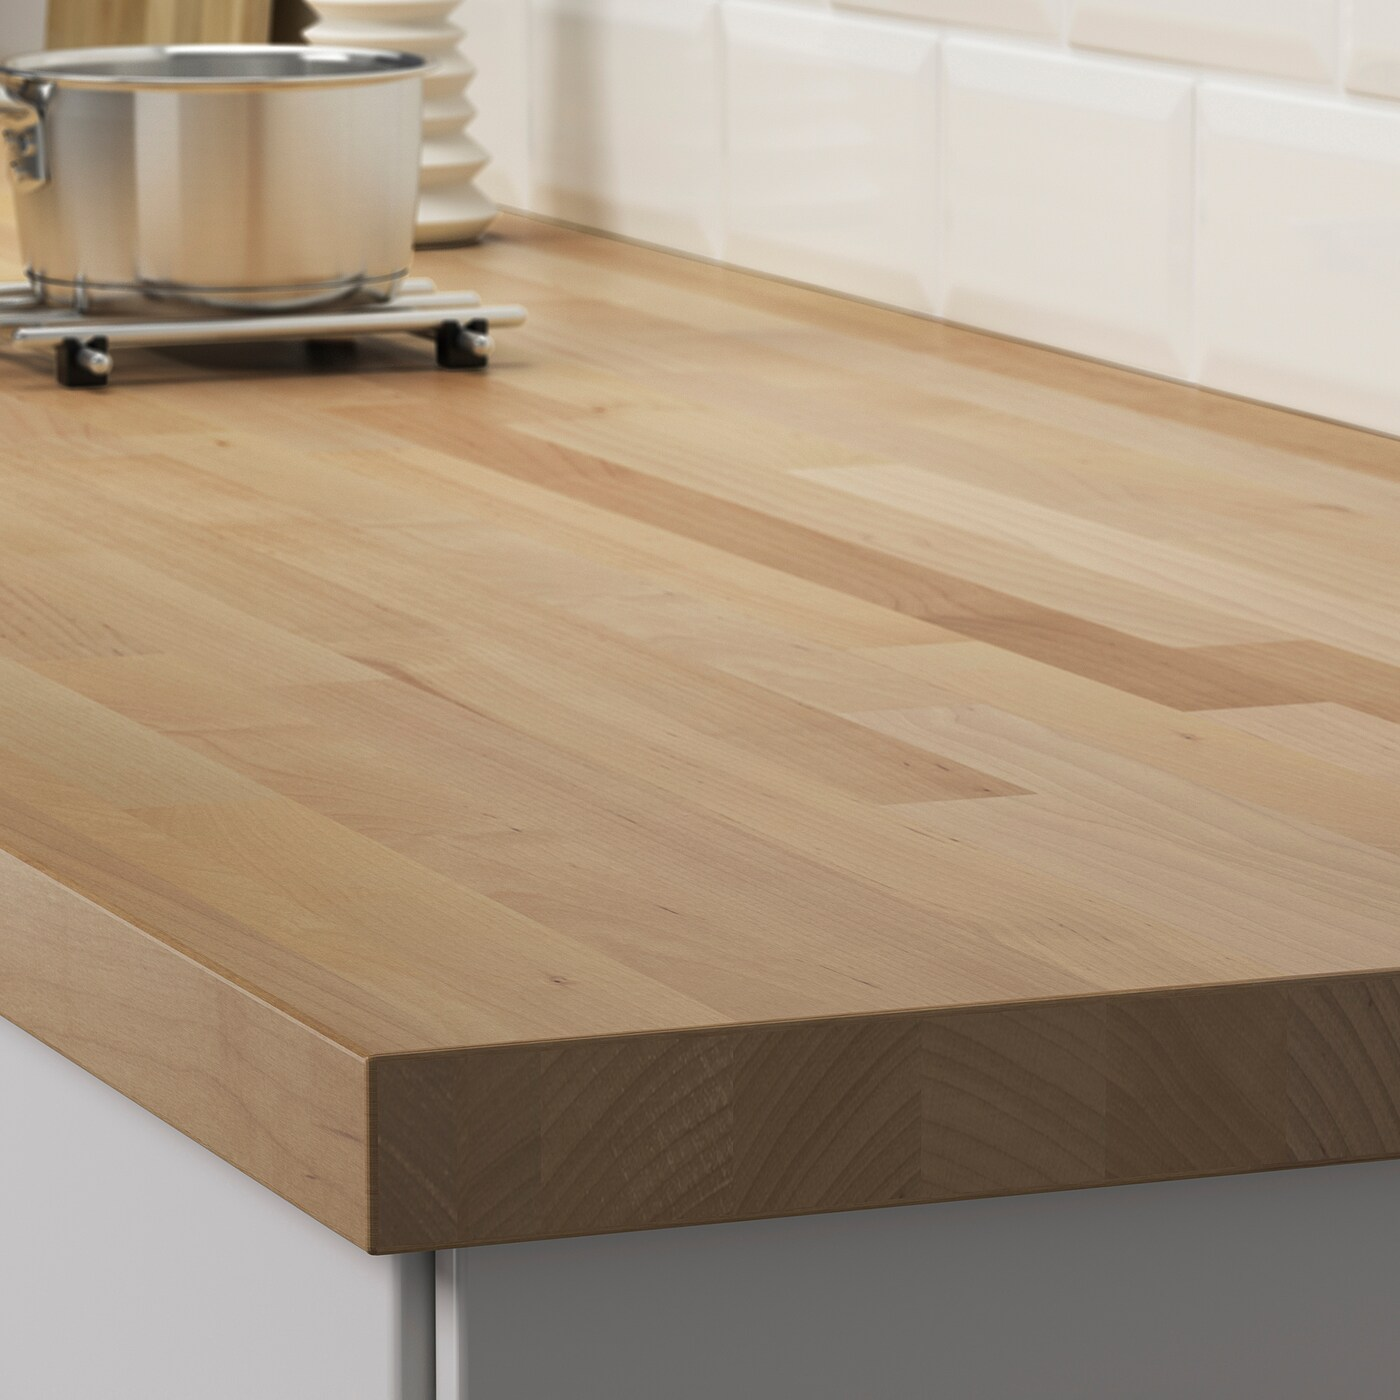 Skogarp Plan De Travail Sur Mesure Bouleau Bois Massif 45 Ikea